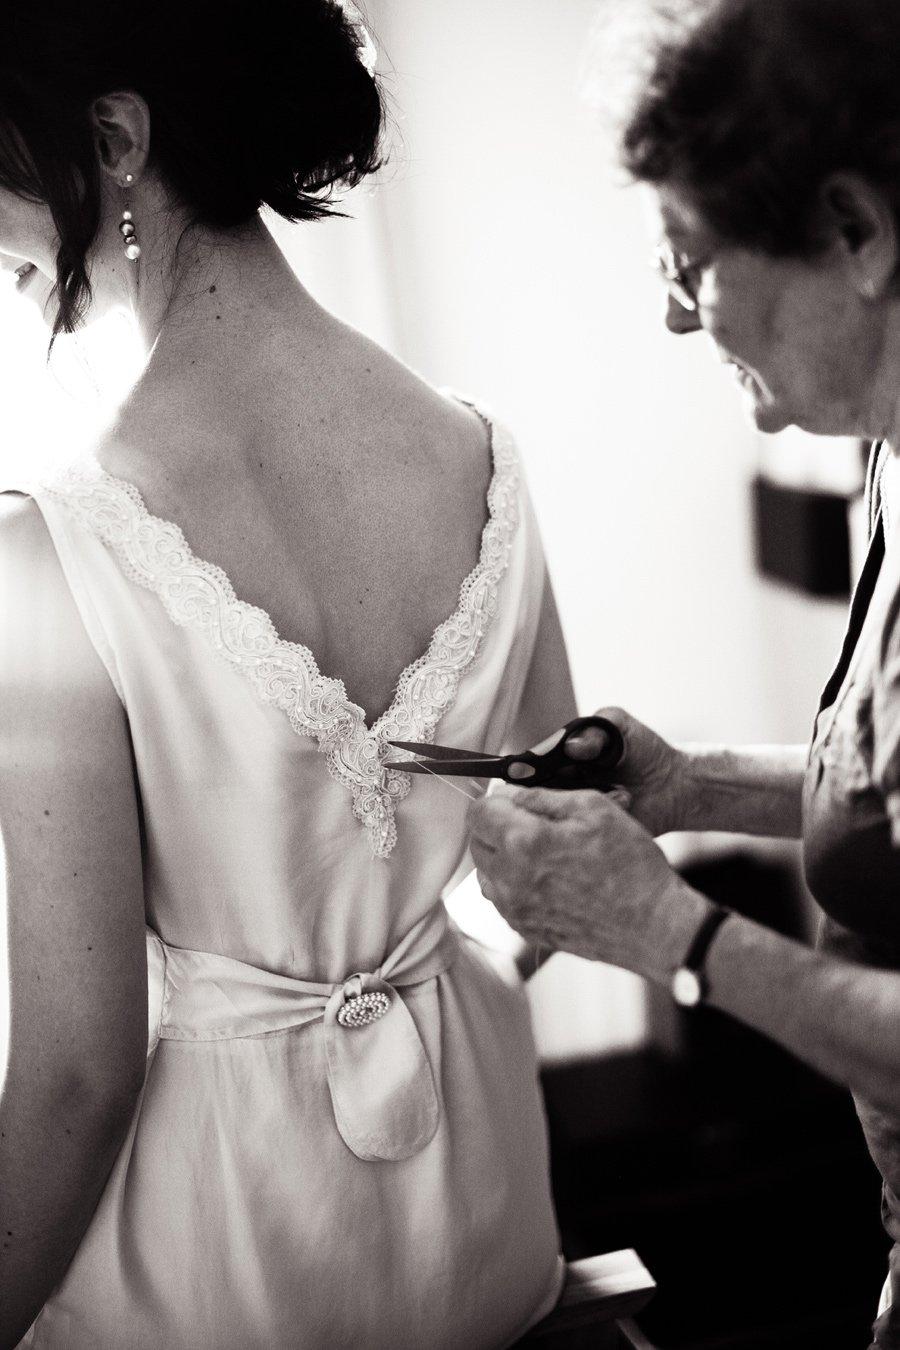 Berkshire-Wedding-Photography-Fazackarley-Aisling-and-Philip-08